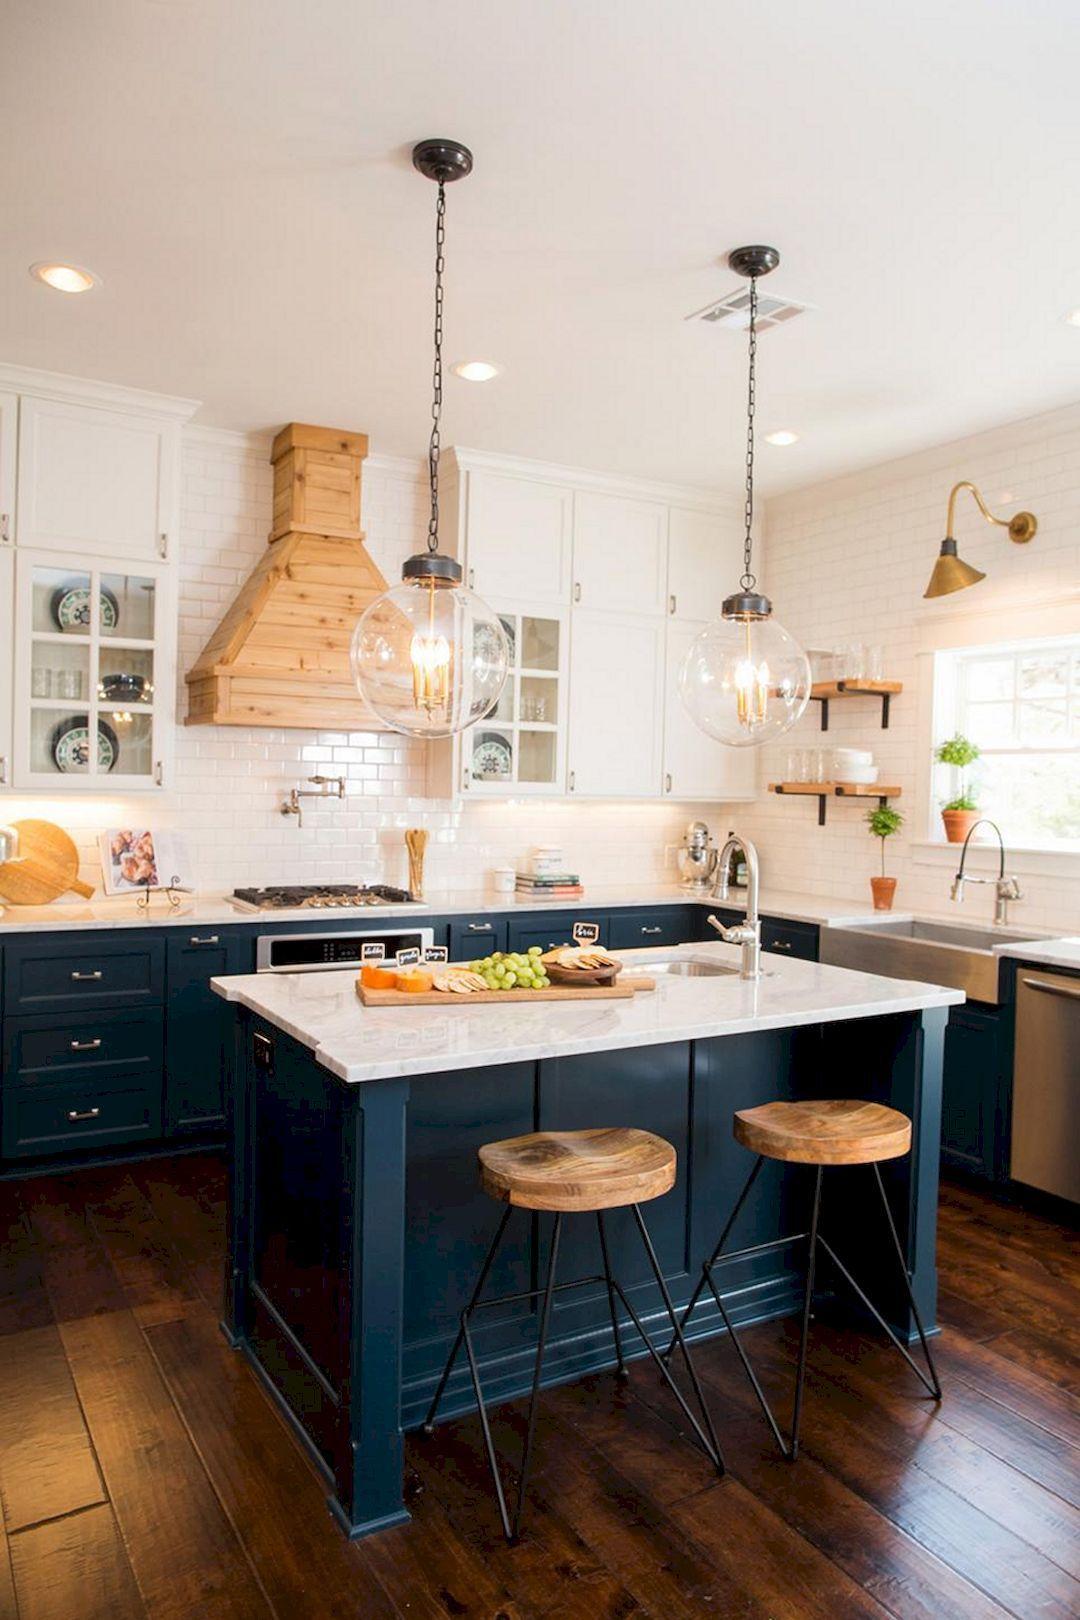 Best Kitchen Gallery: Top 42 Kitchen Design Inspirations From Joanna Gaines Joanna of Kitchen Design Inspiration on rachelxblog.com